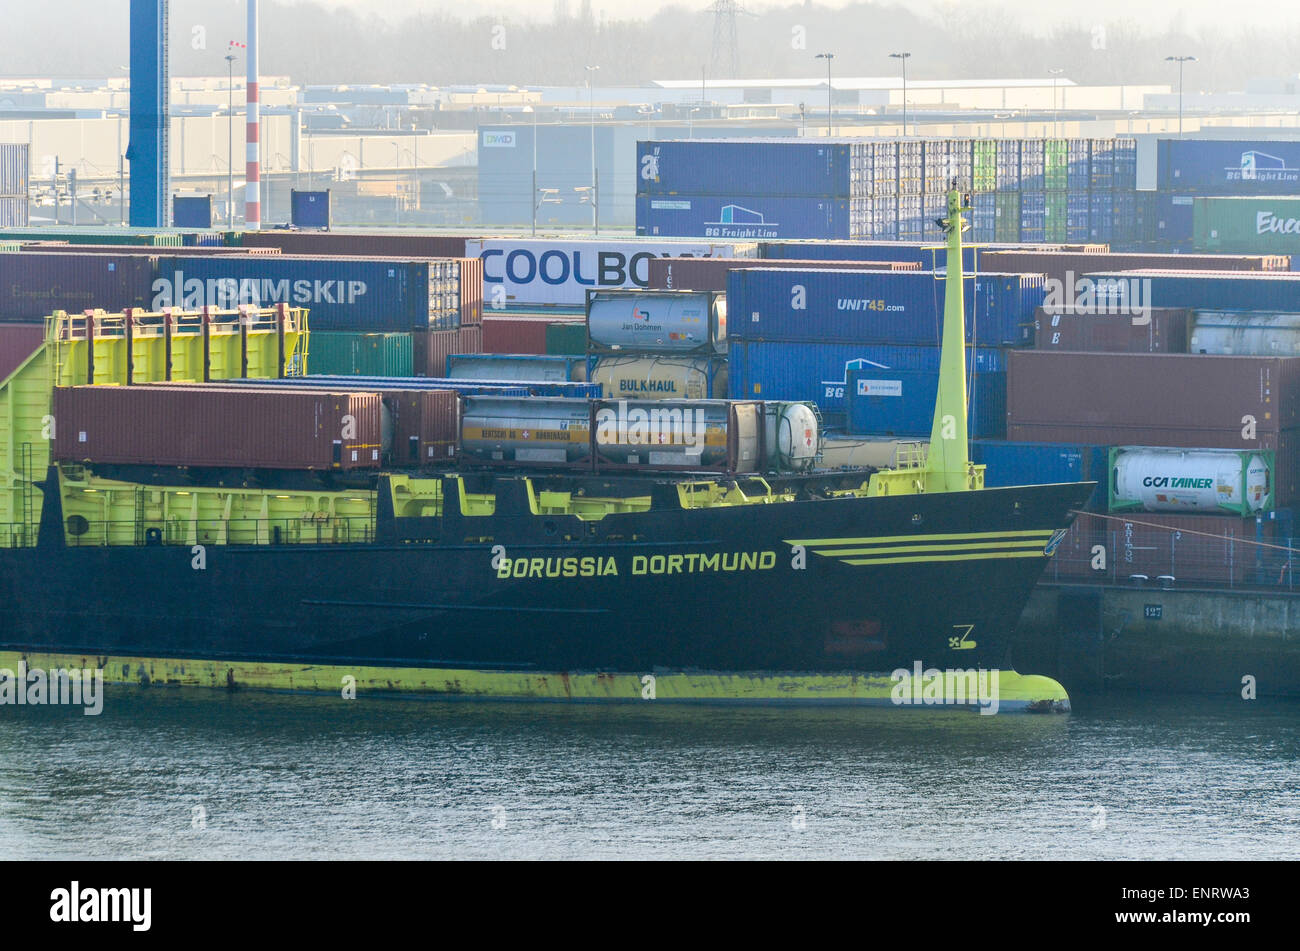 Borussia Dortmund ship docked in the port of Rotterdam, Netherlands - Stock Image